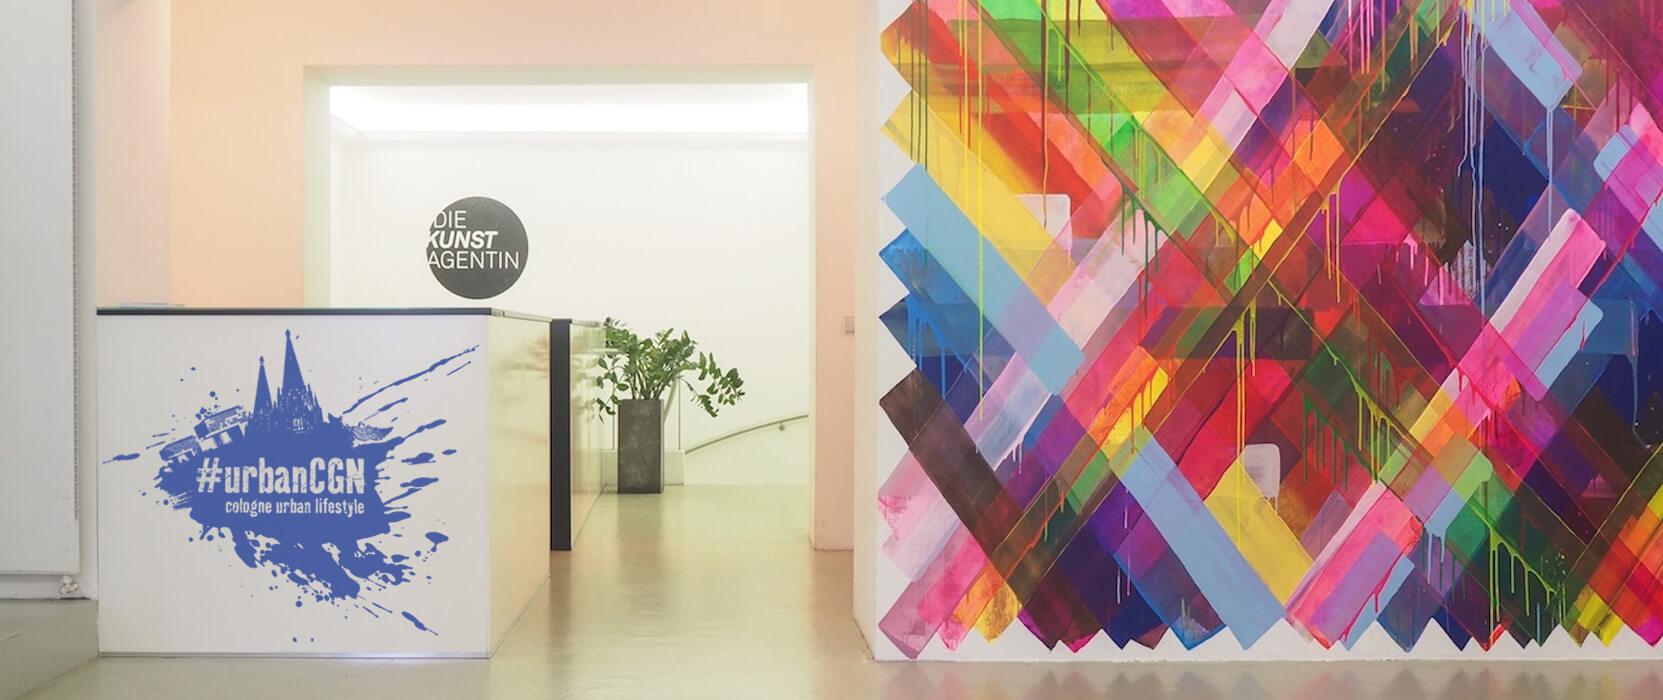 "Maya Hayuk, Solo Show ""Alles klar"", Mural in der Galerie, 2014"